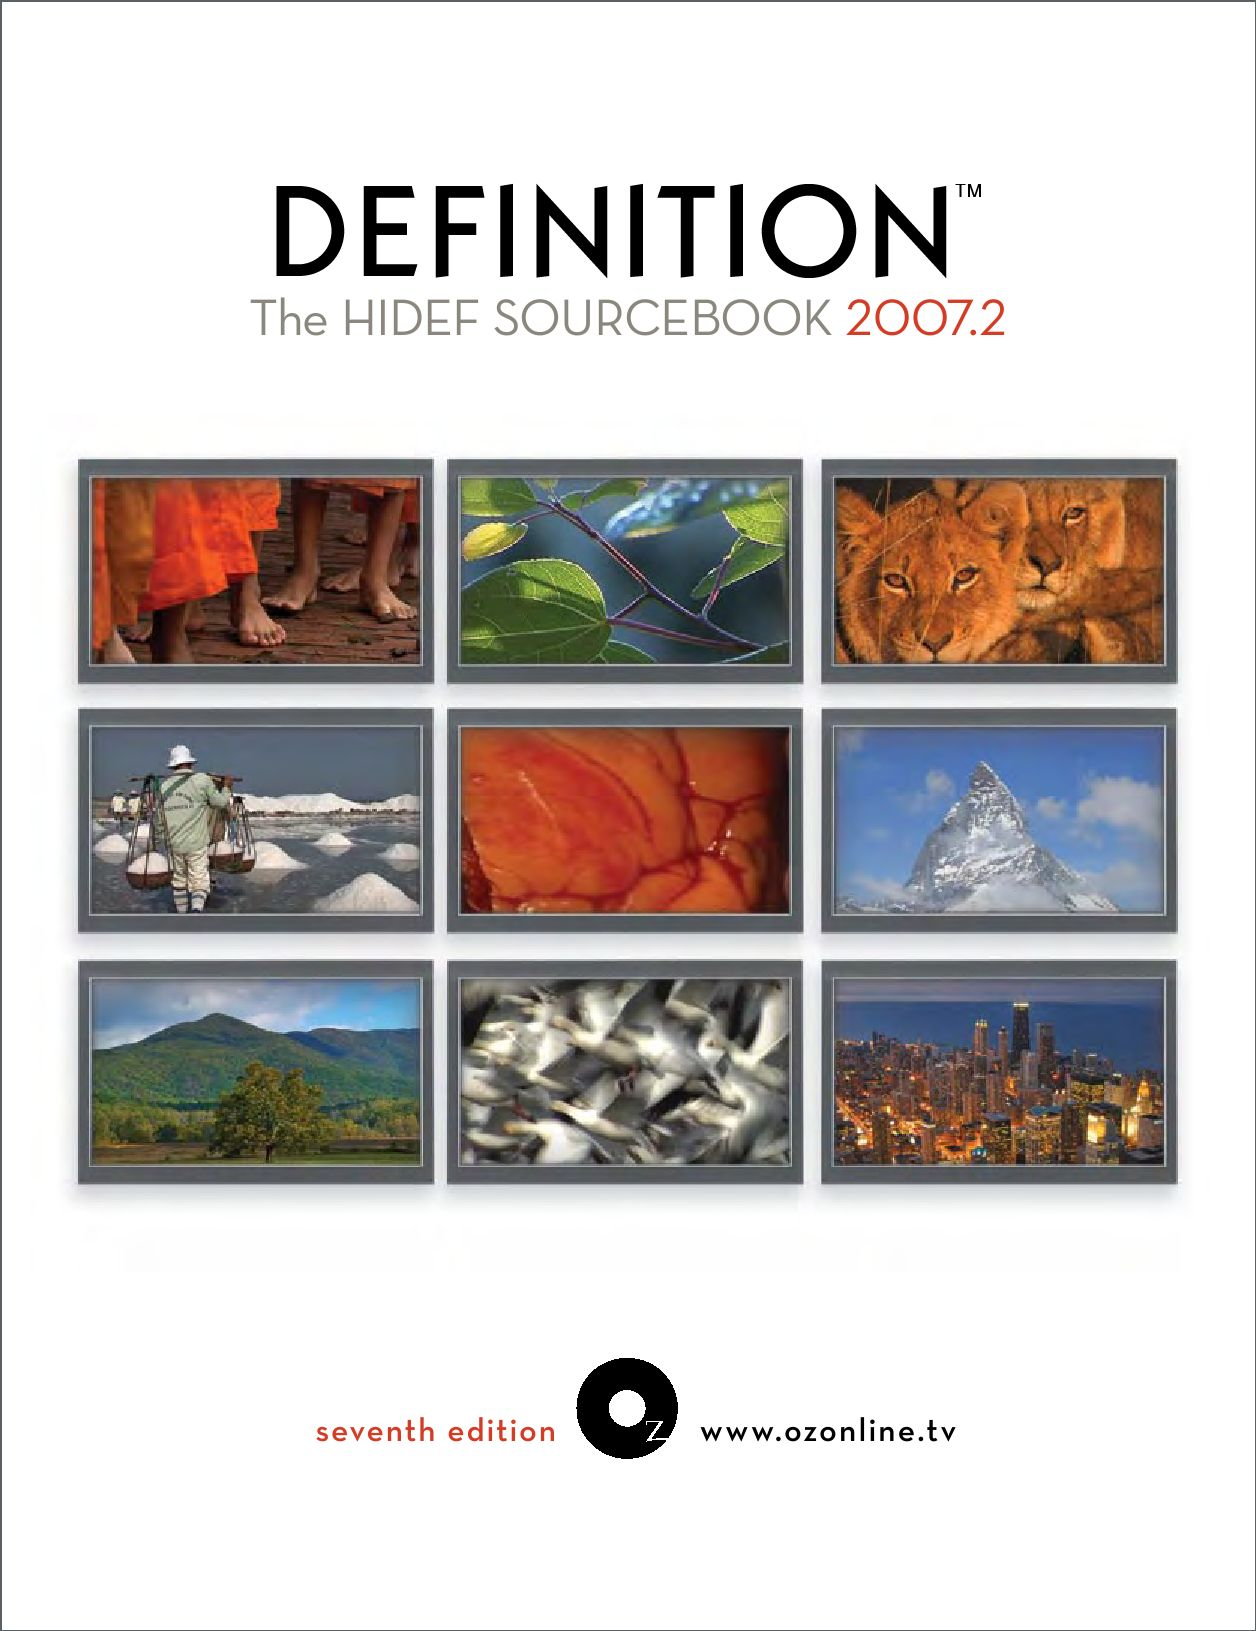 df051e8917cd DEFINITION  The Hi-Def Sourcebook by Oz Publishing